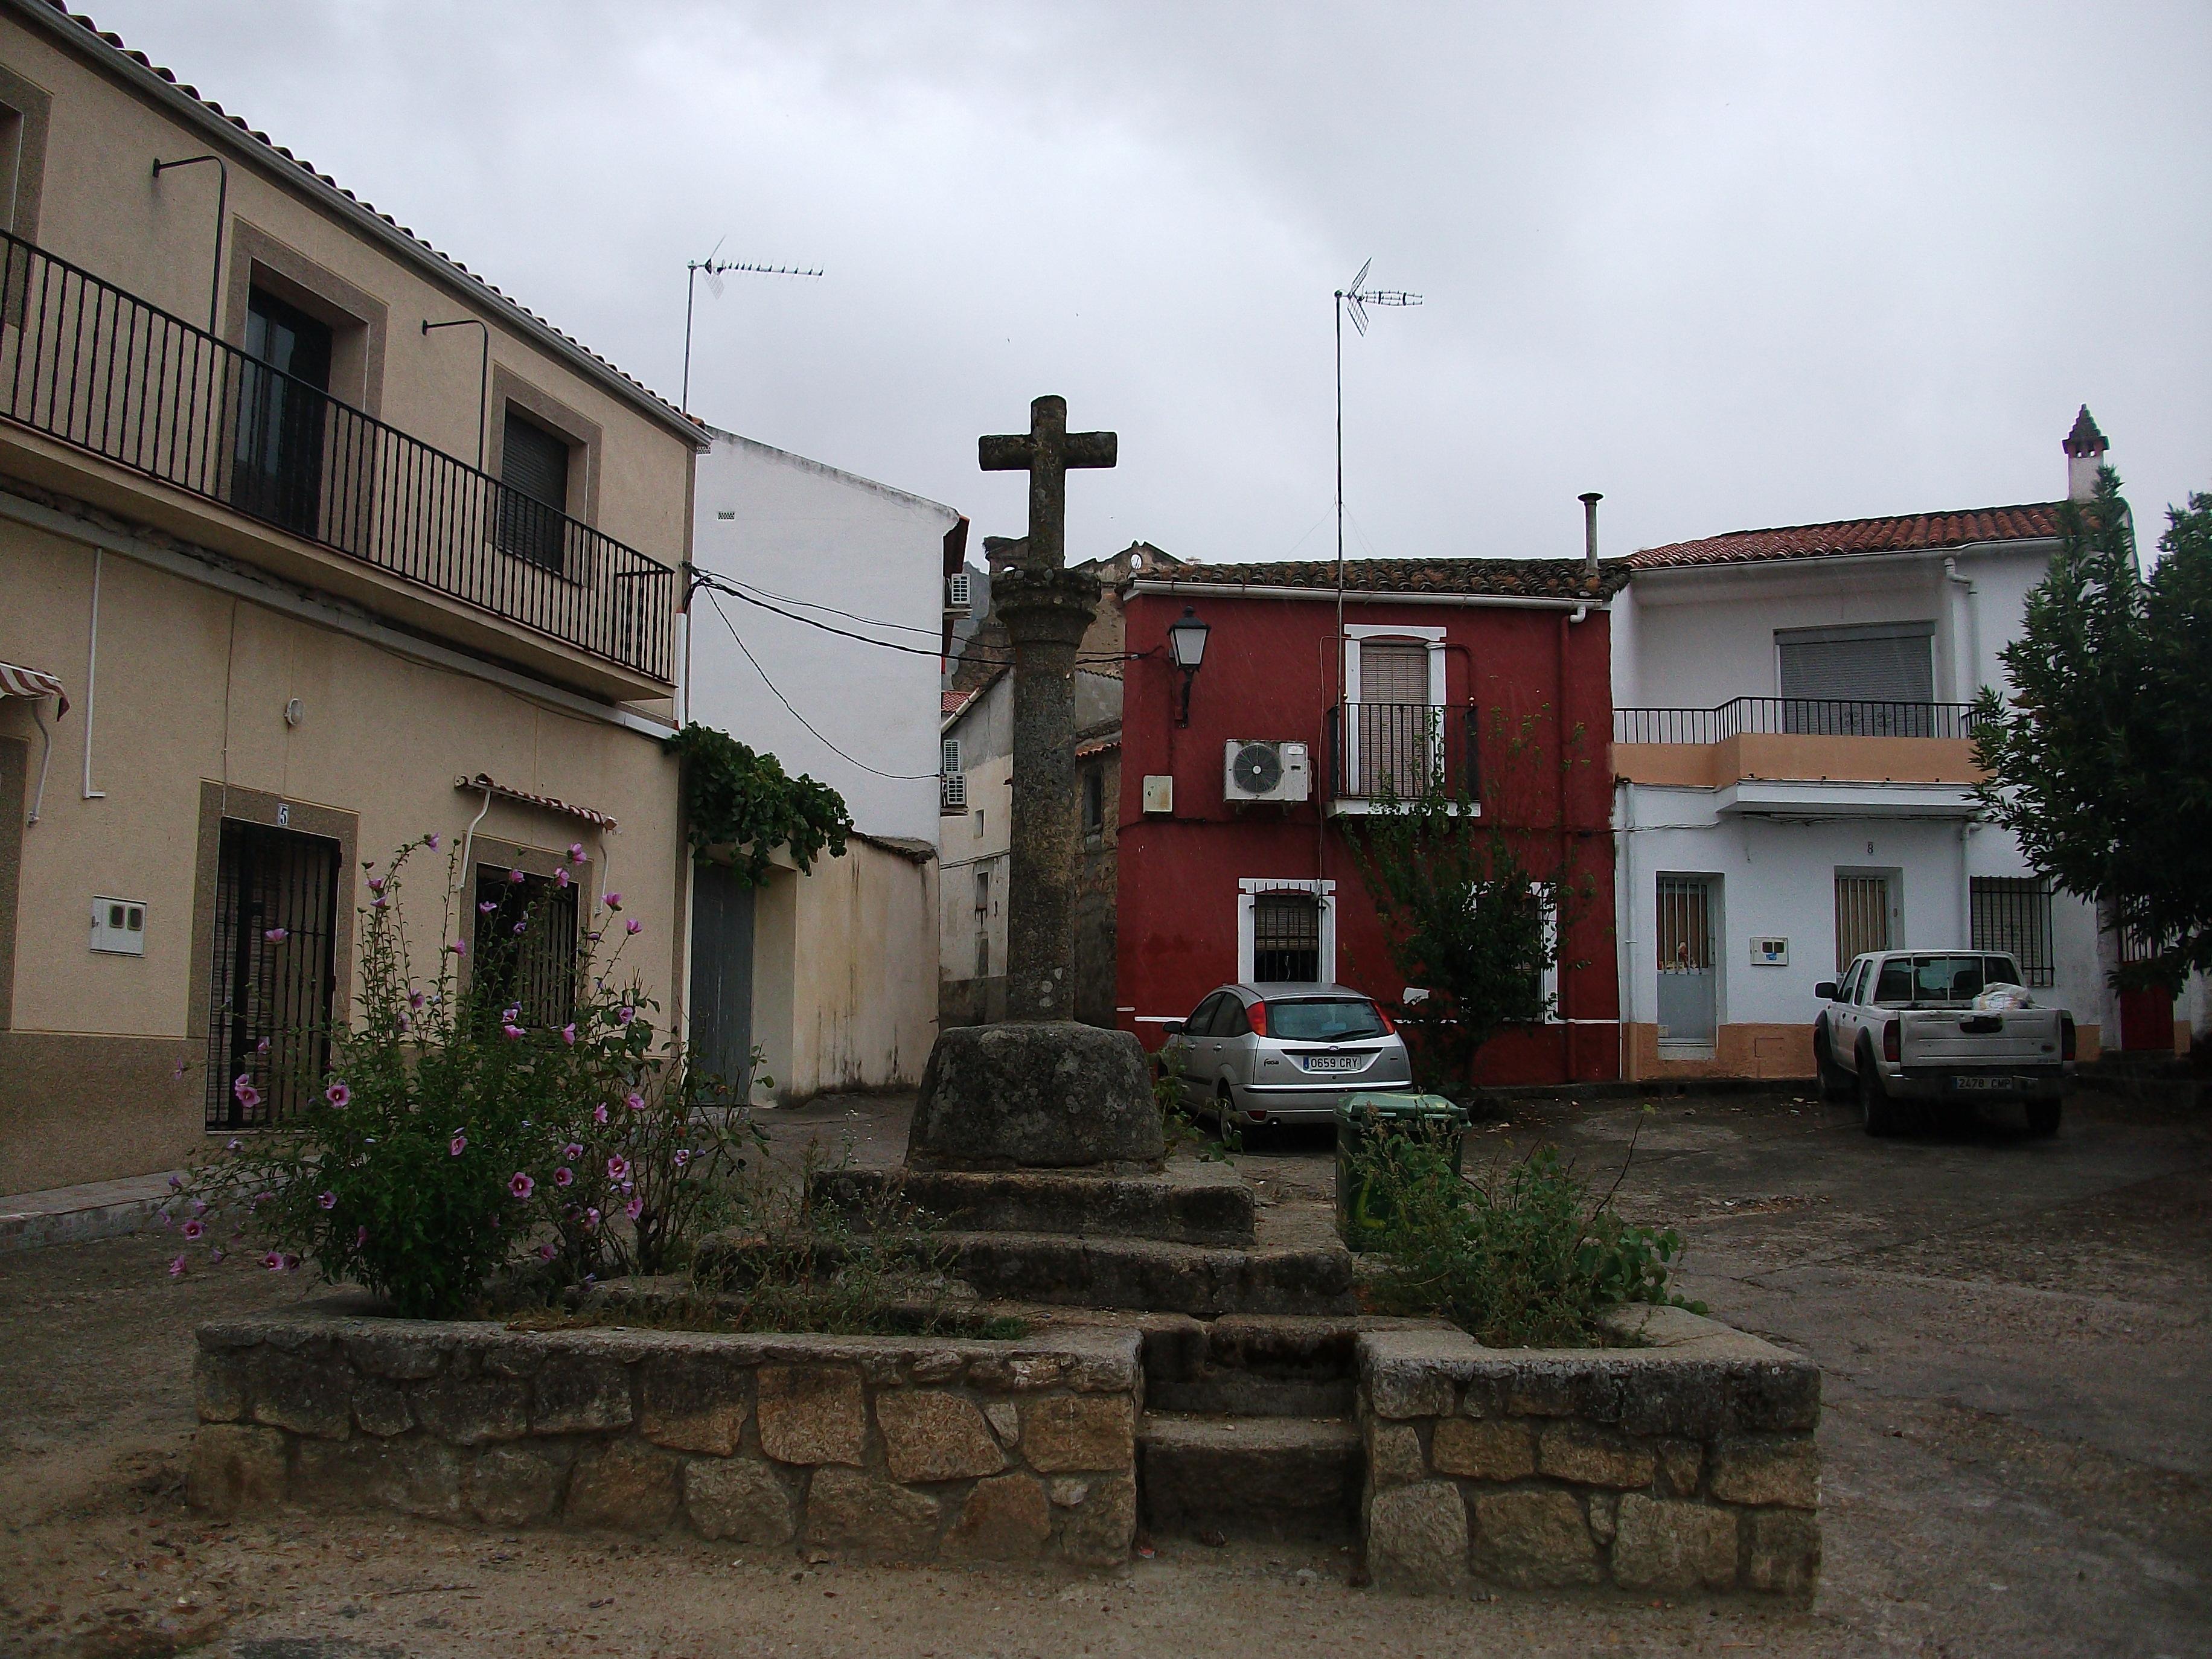 Santa Cruz de la Sierra (Cáceres)